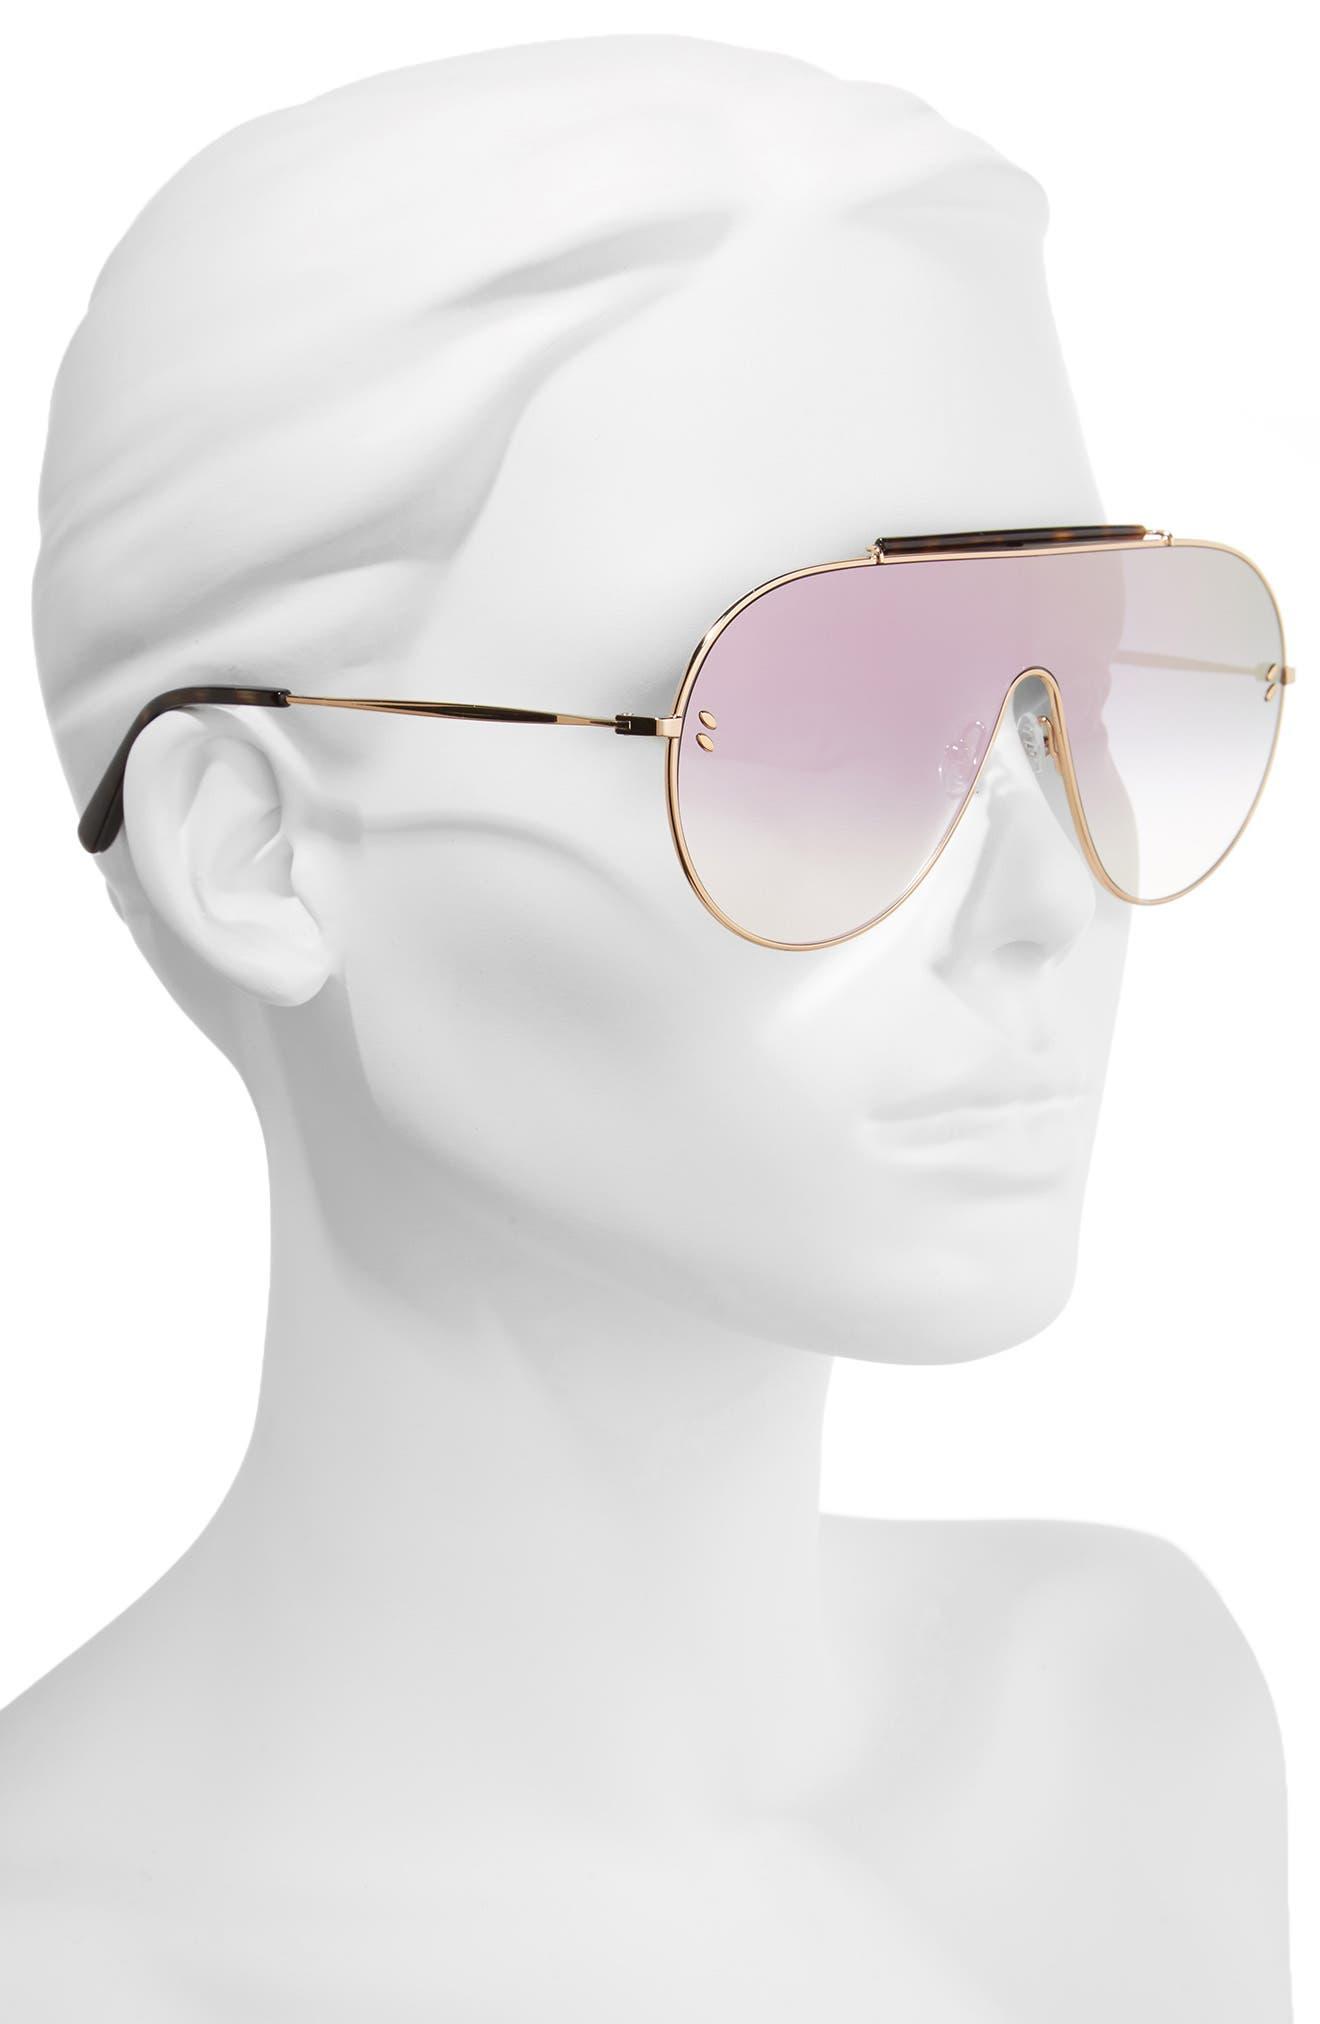 65mm Shield Sunglasses,                             Alternate thumbnail 2, color,                             Gold